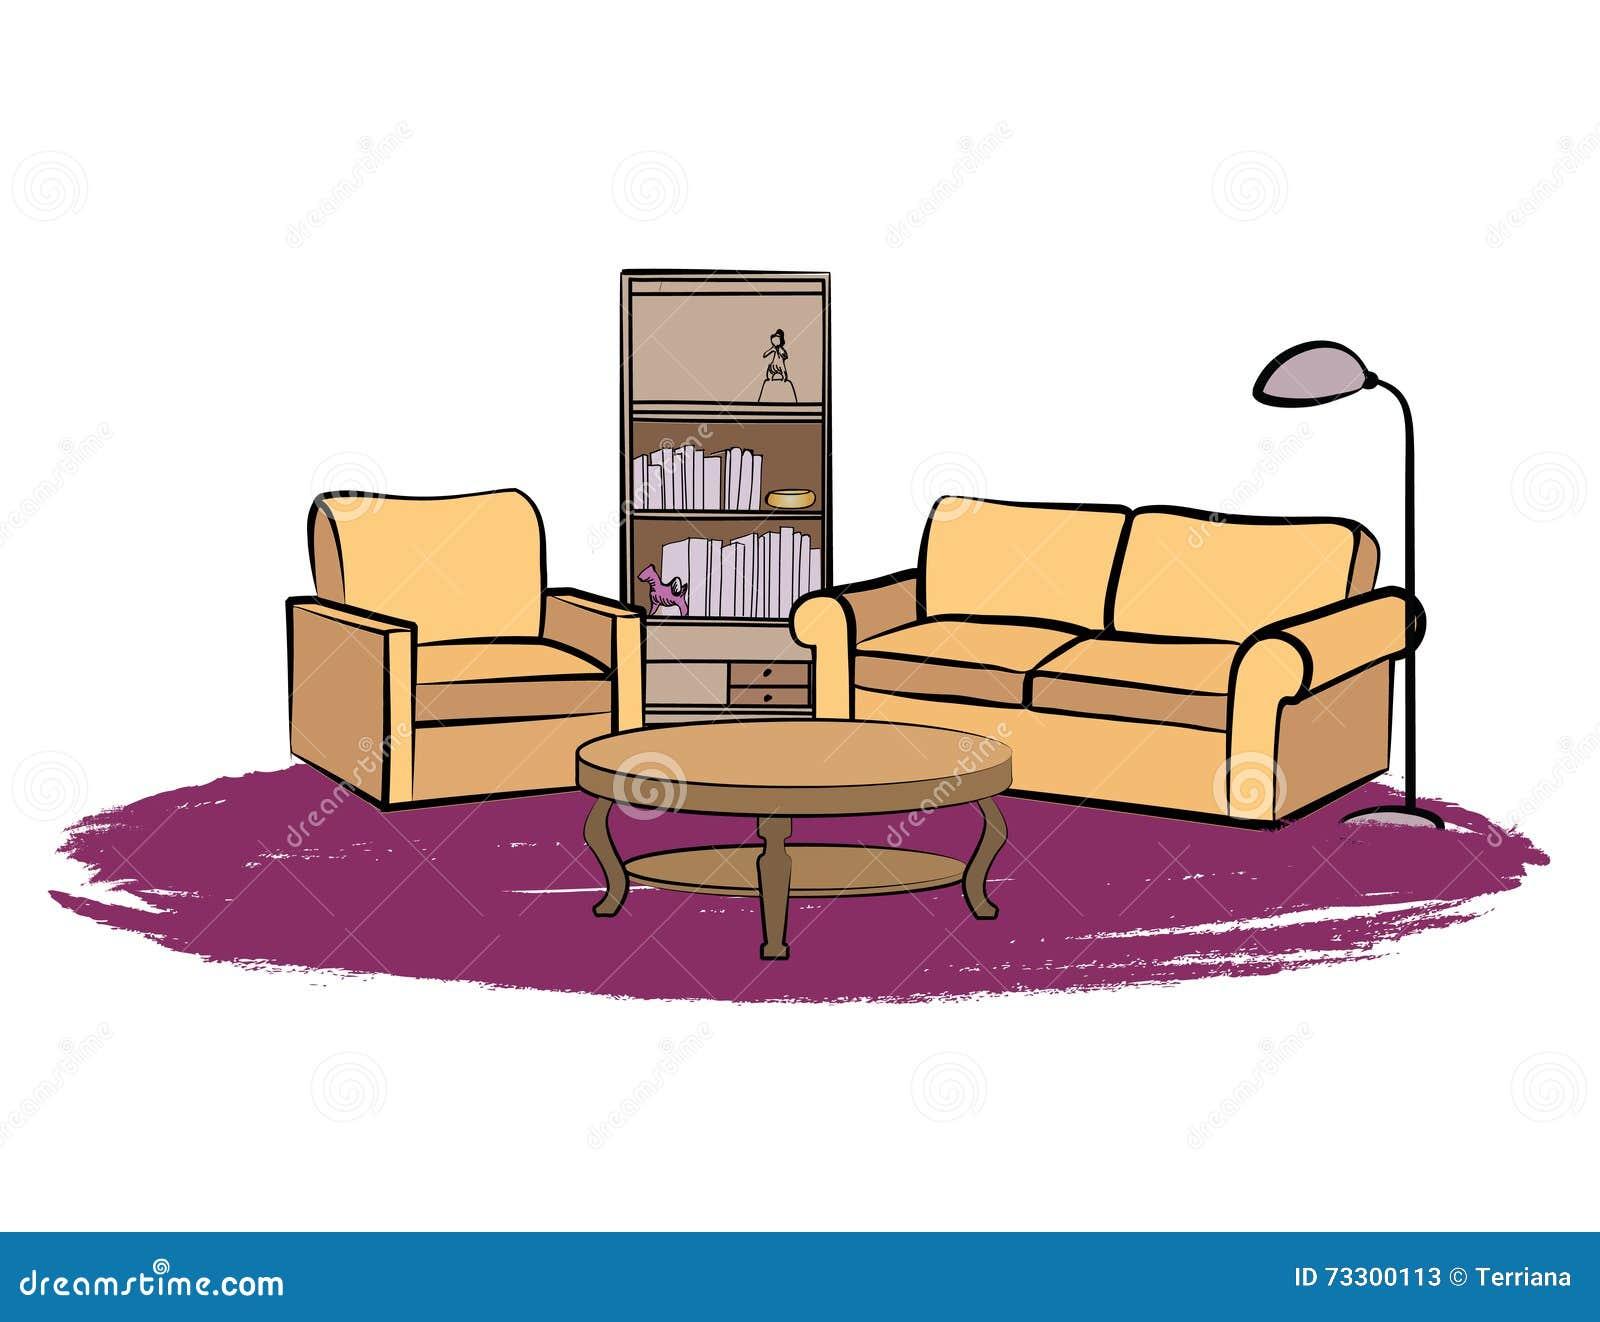 Living Room Interior Furniture With Sofa Floor Lamp